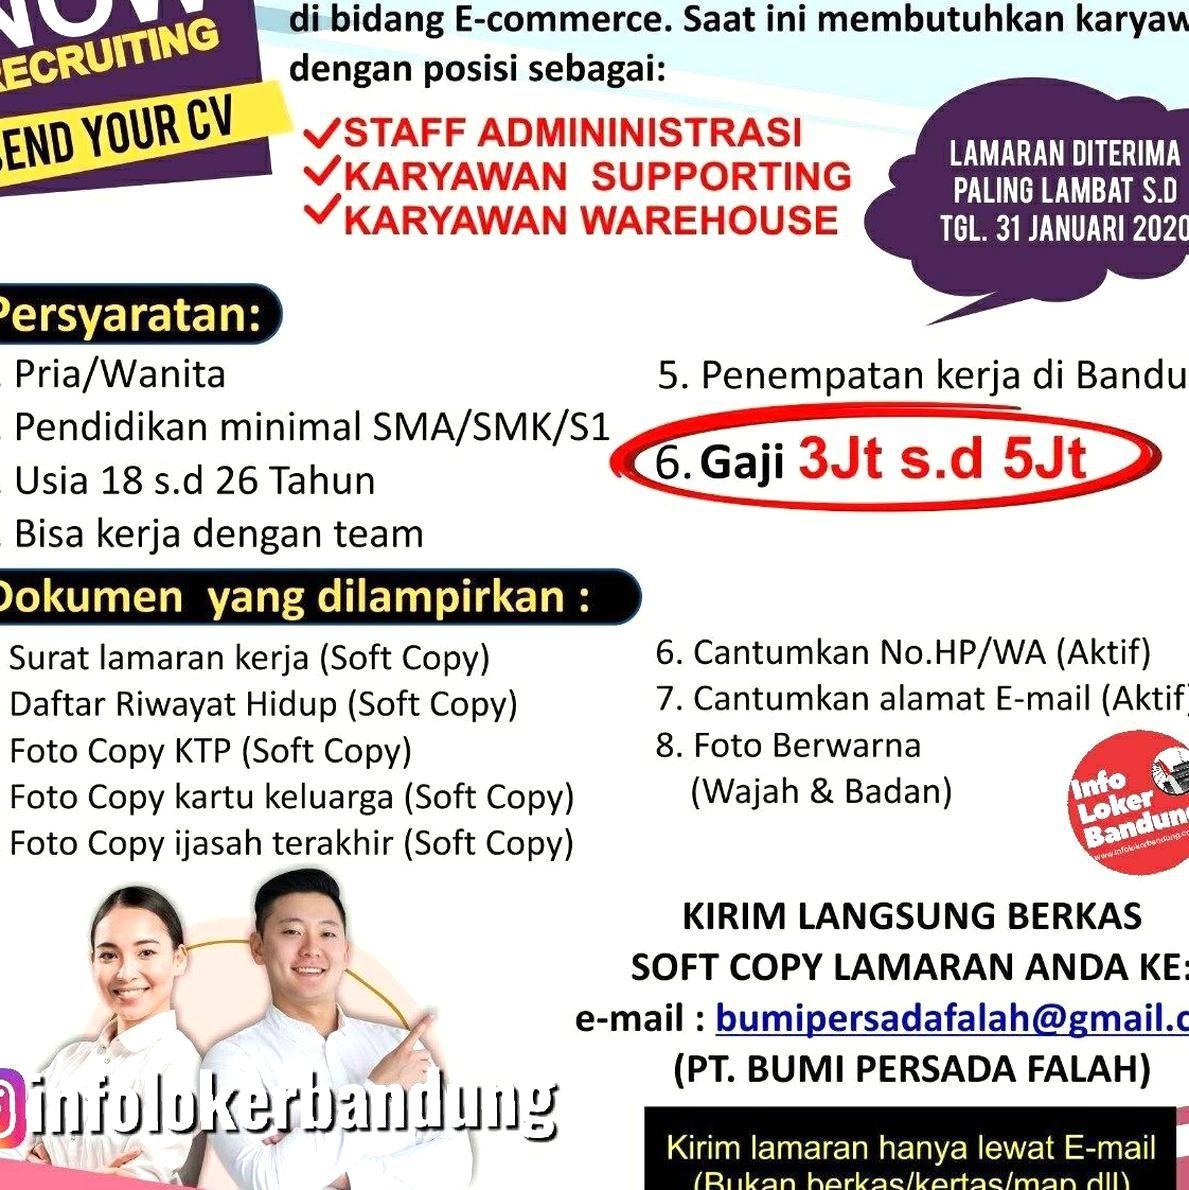 Gaji Karyawan Fotocopy | Cahunit.com